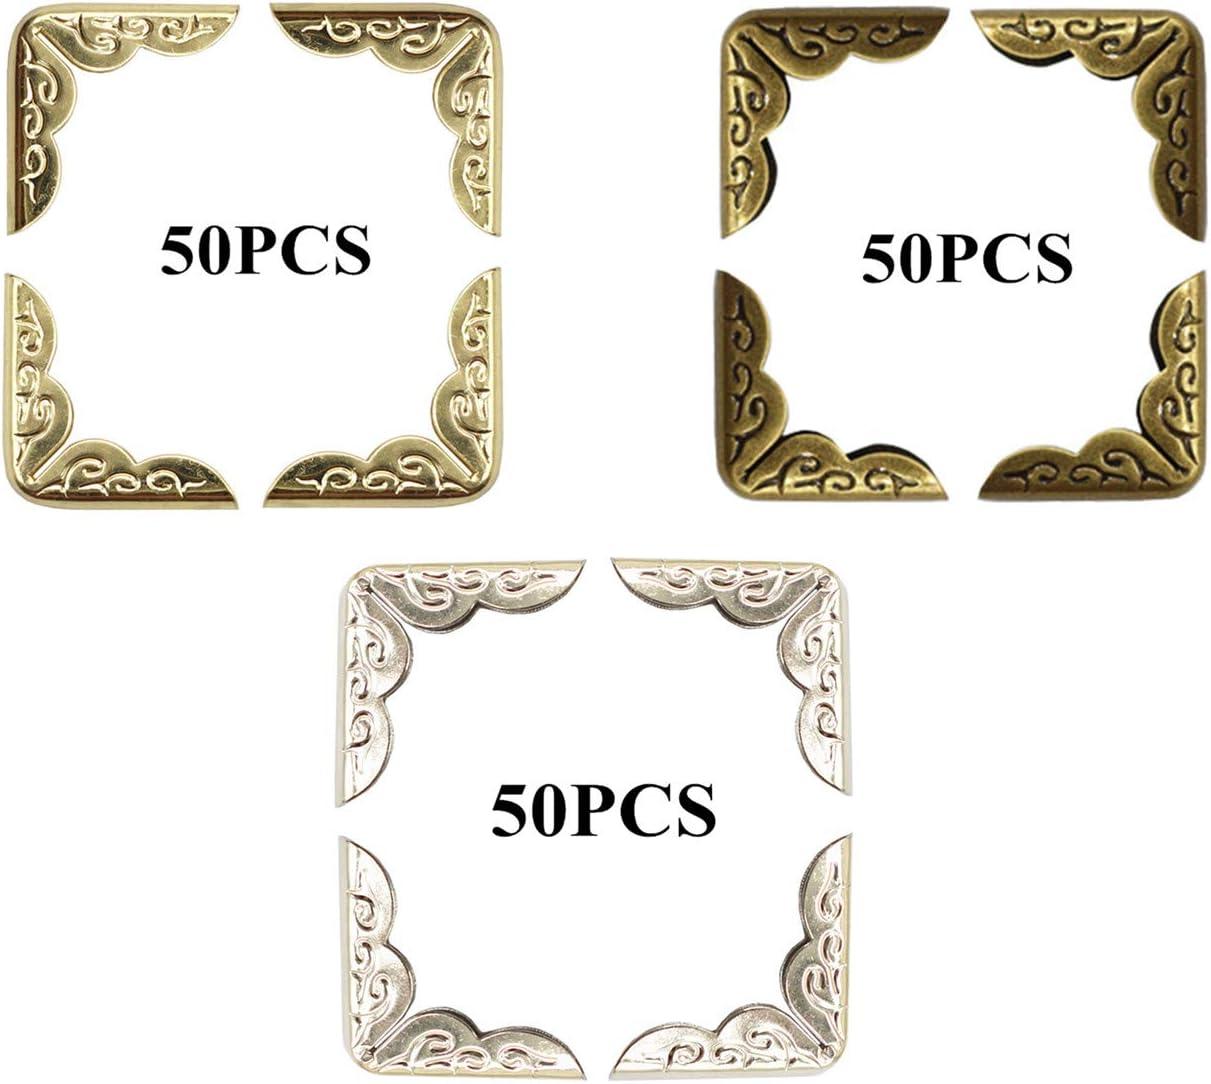 PHAETON 150PCS Metal Book Corner Photo Protector Selling rankings Super special price Album Scrapbook